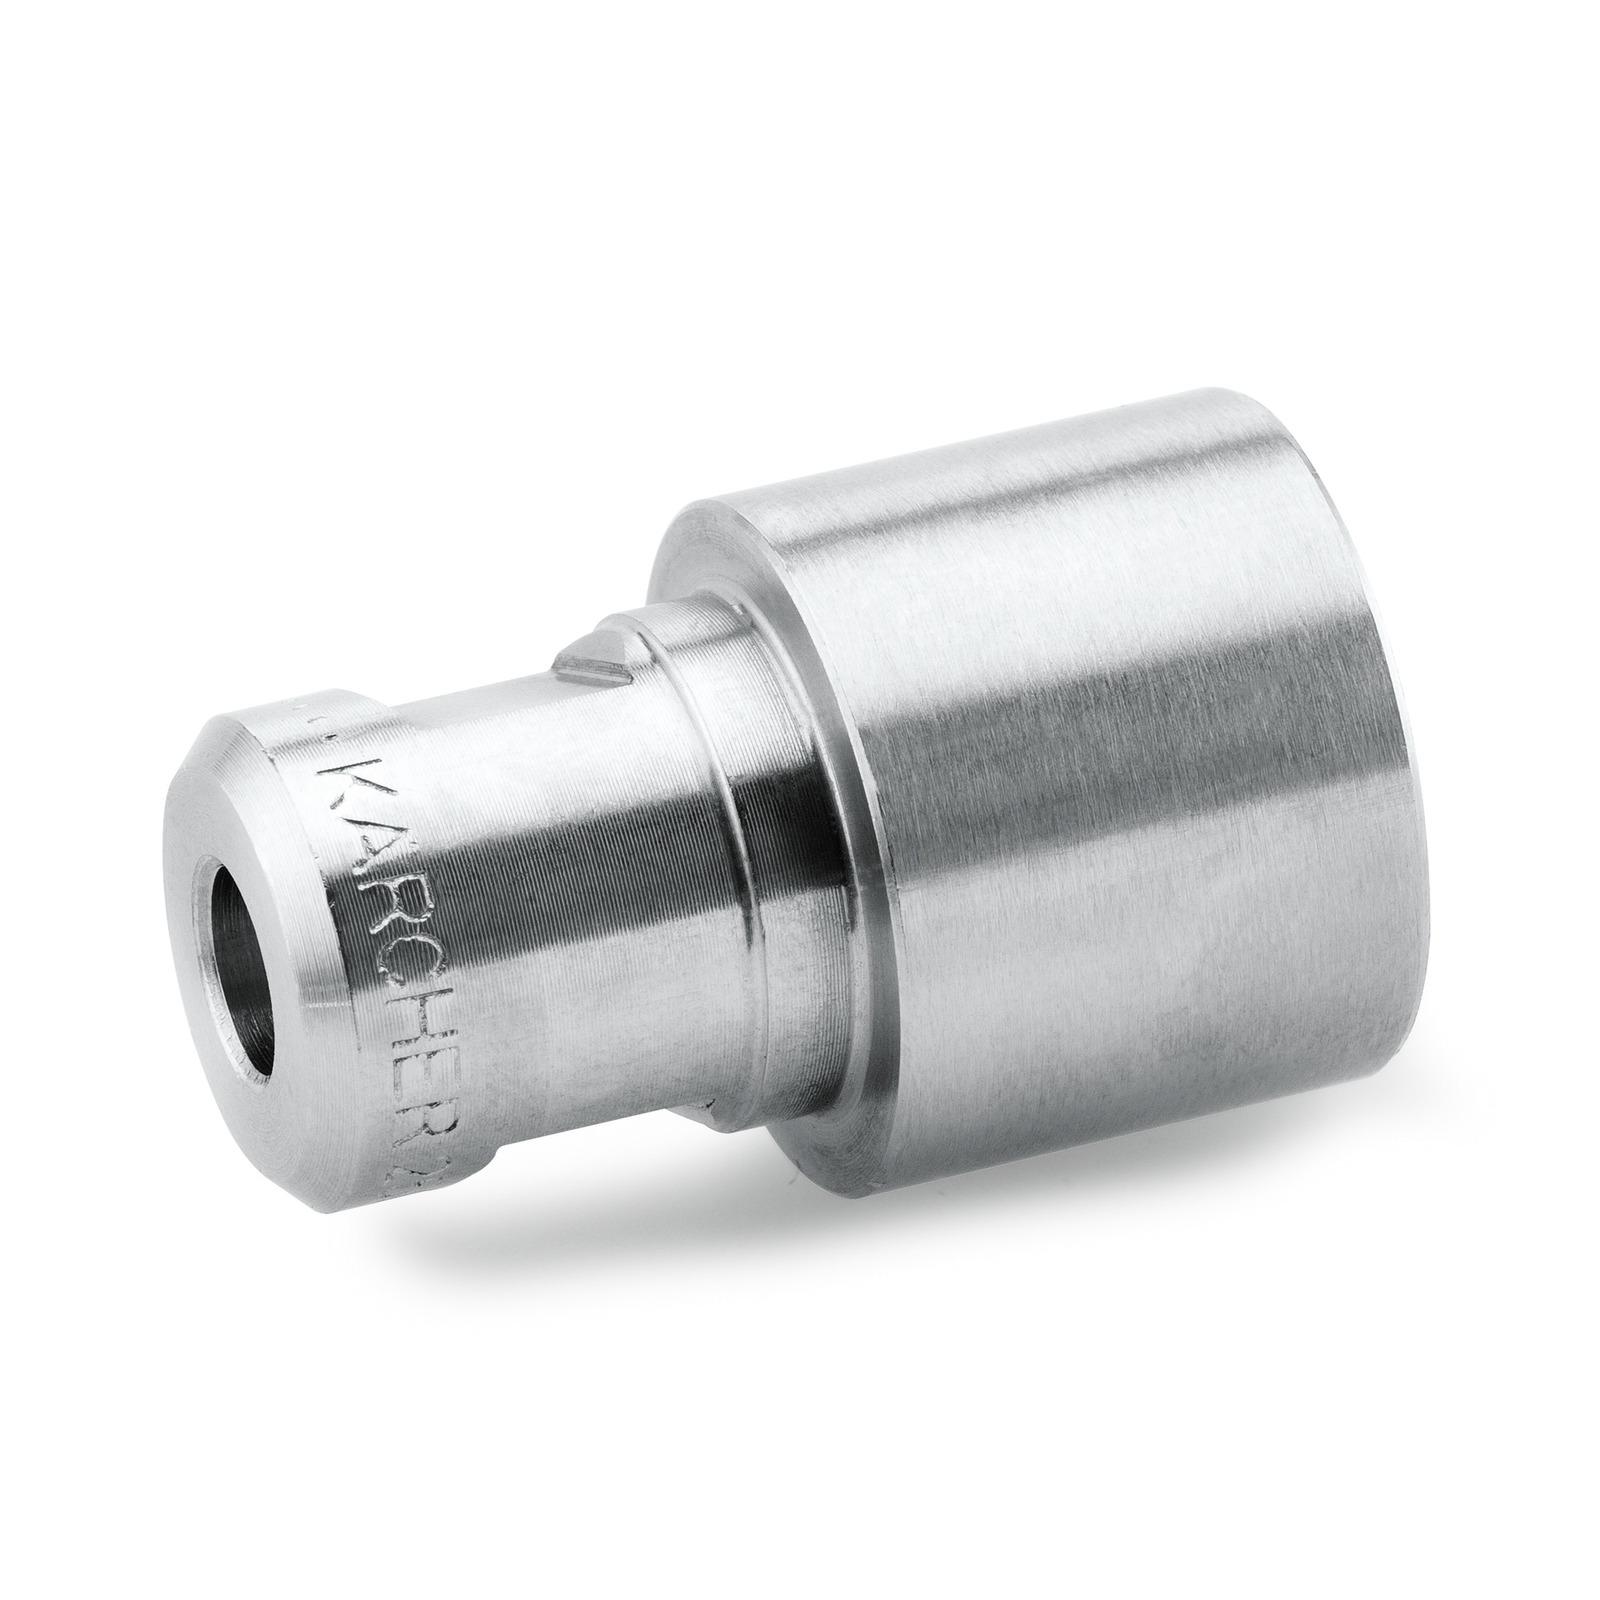 Power nozzle TR 25043